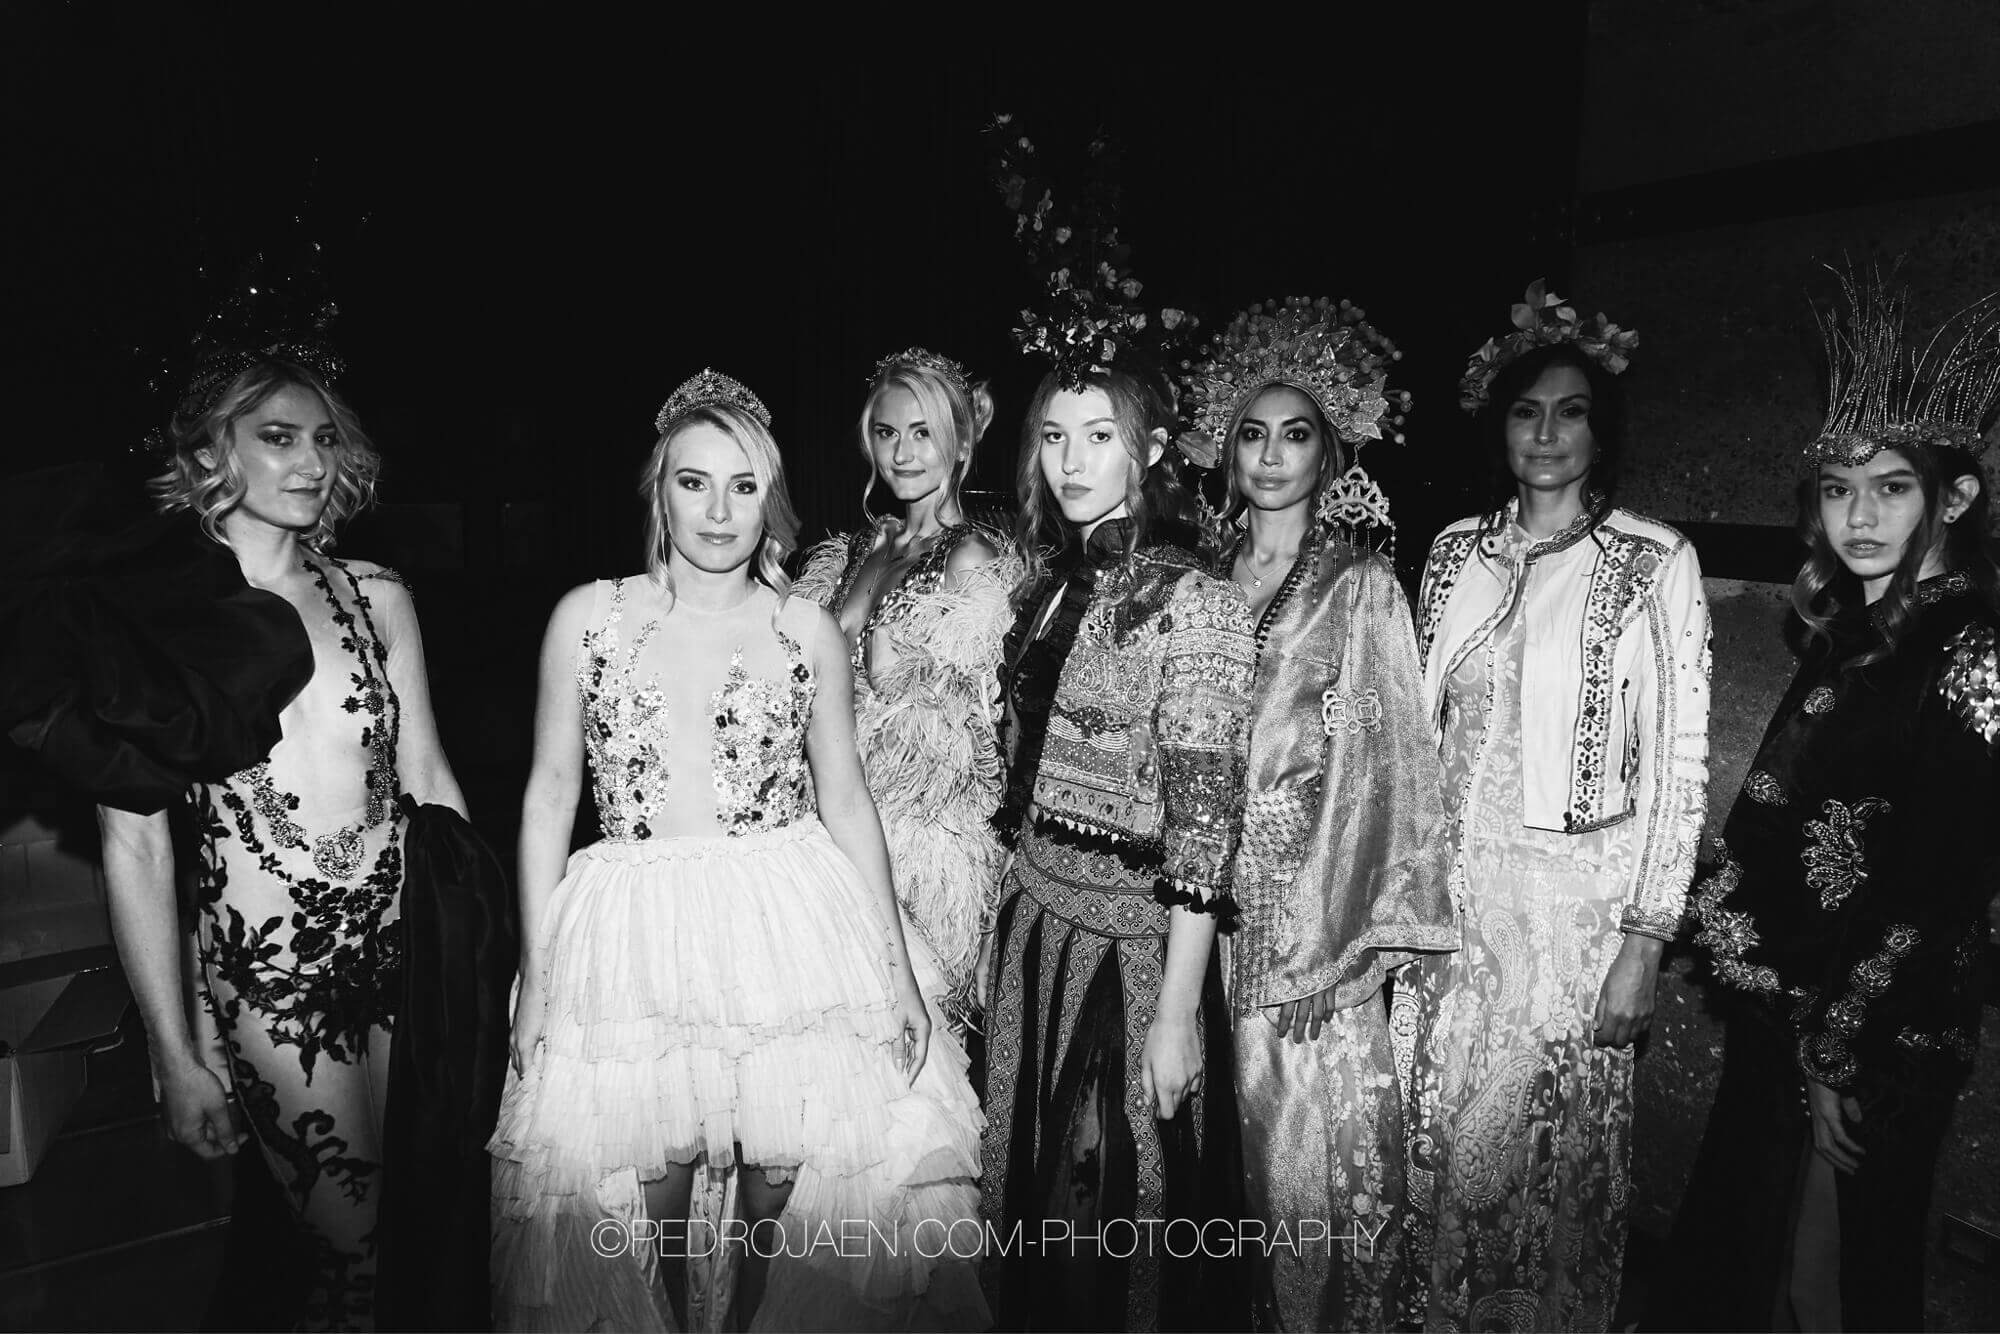 Fem modell kvinnor